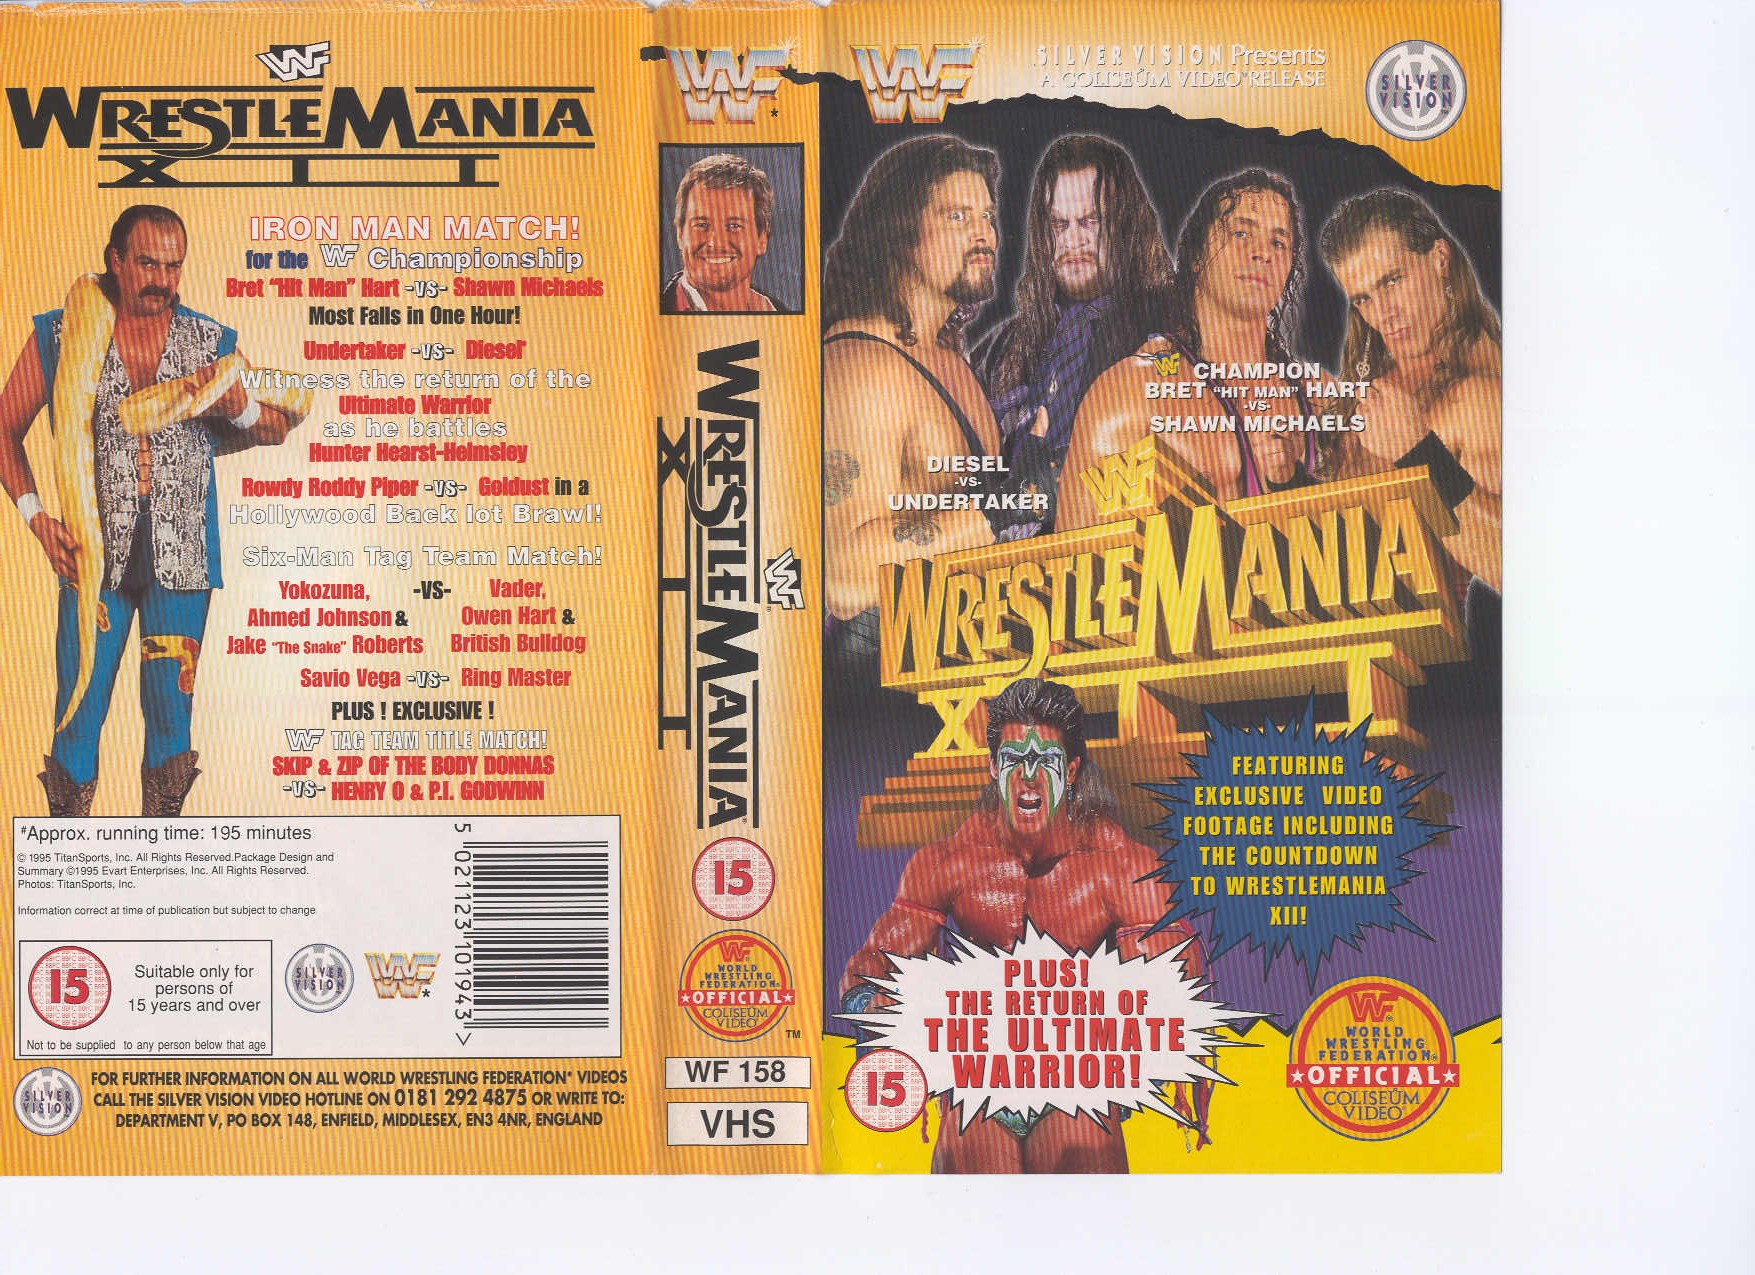 wrestlemania12